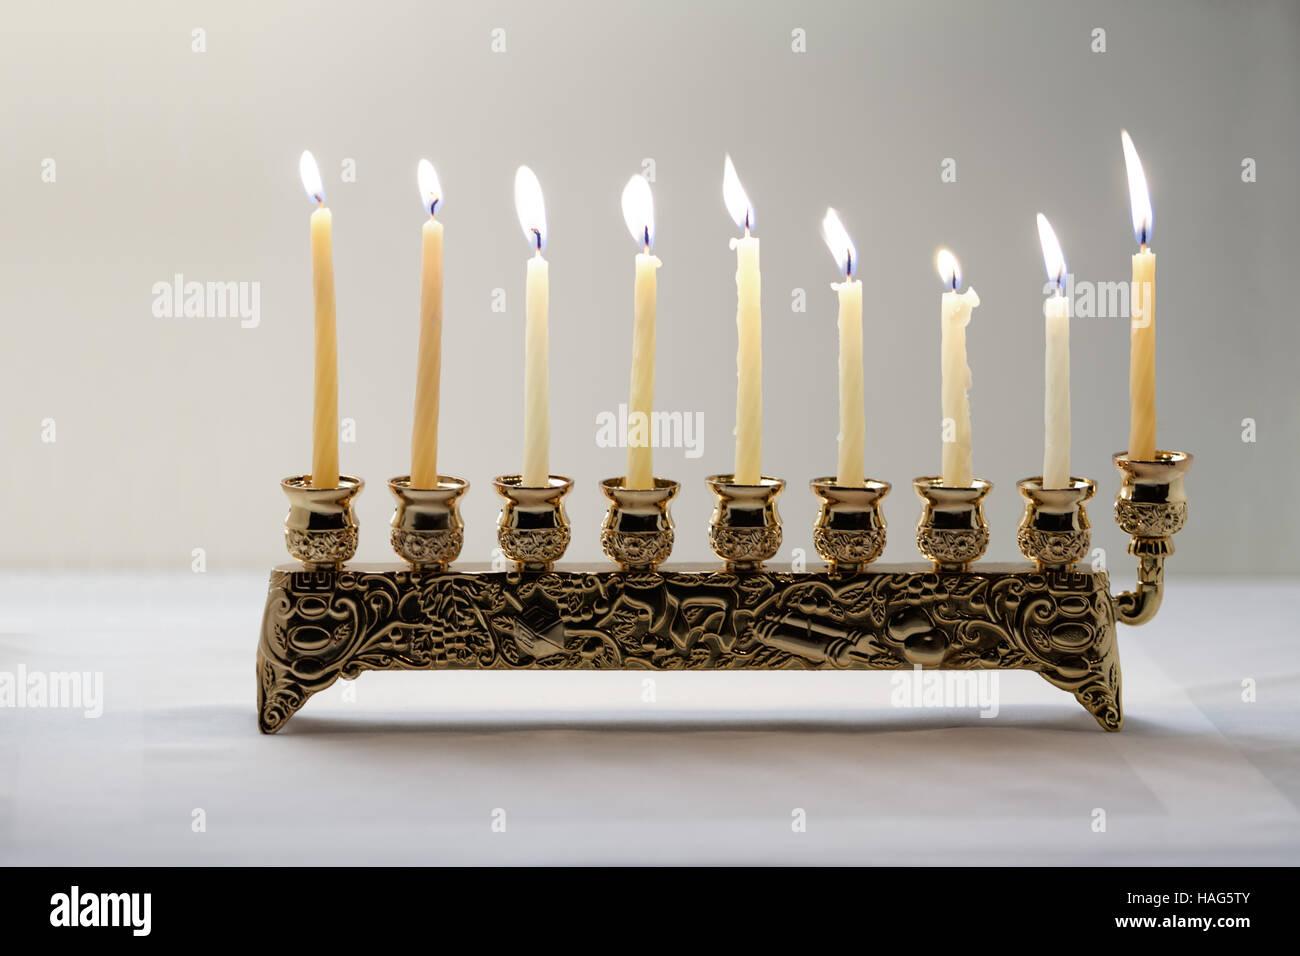 The Symbols Of Hanukkah Nine Branched Mehorah Hanukiah Stock Photo